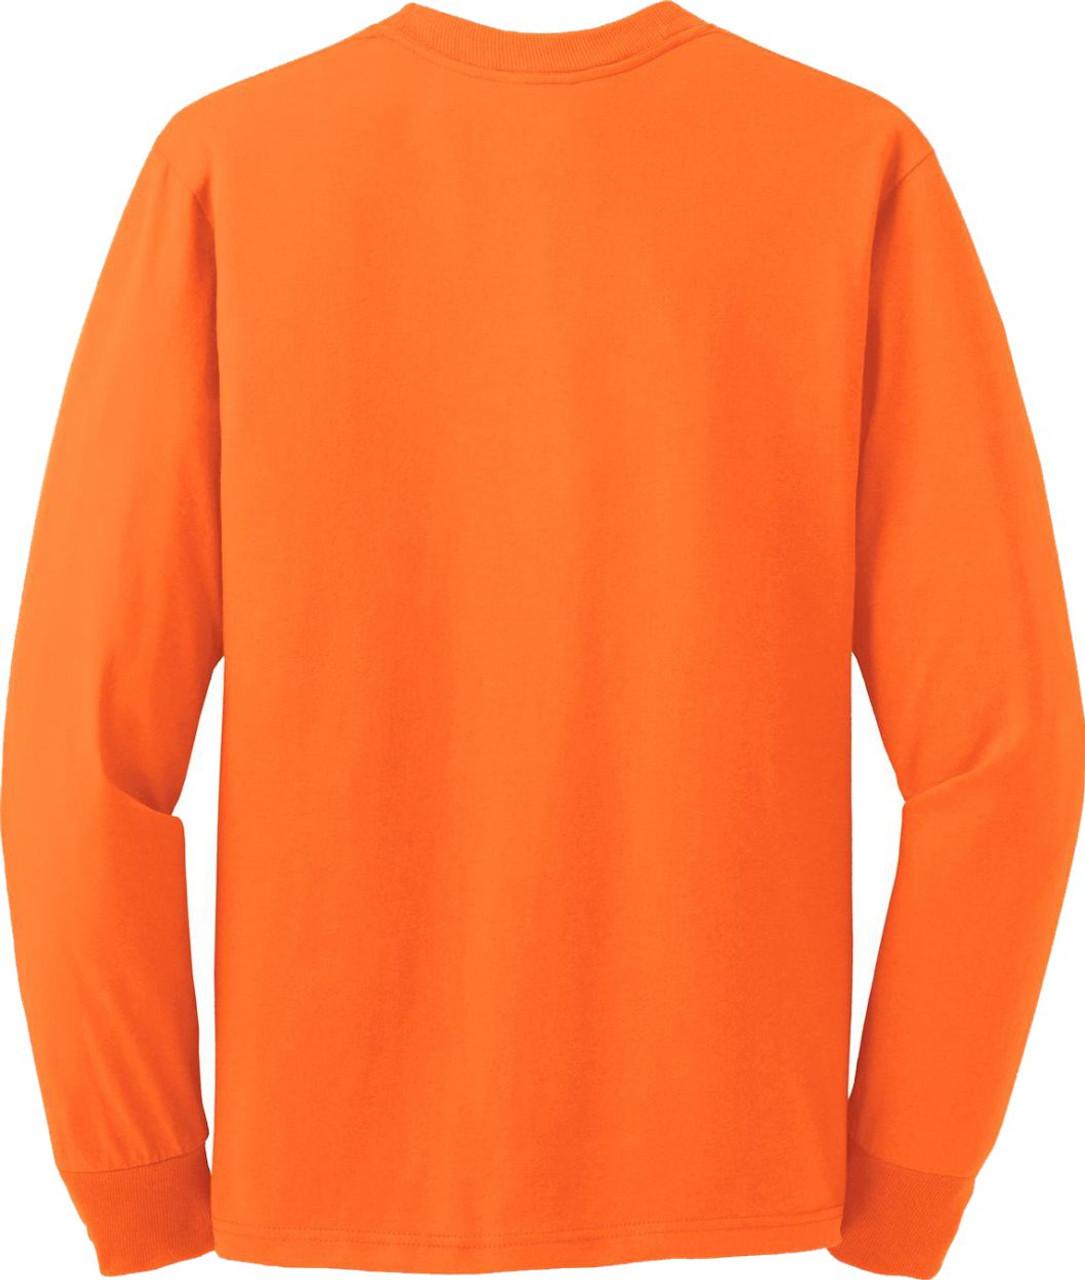 Best Construction Long Sleeve Safety Shirts | Safety Orange T-Shirt